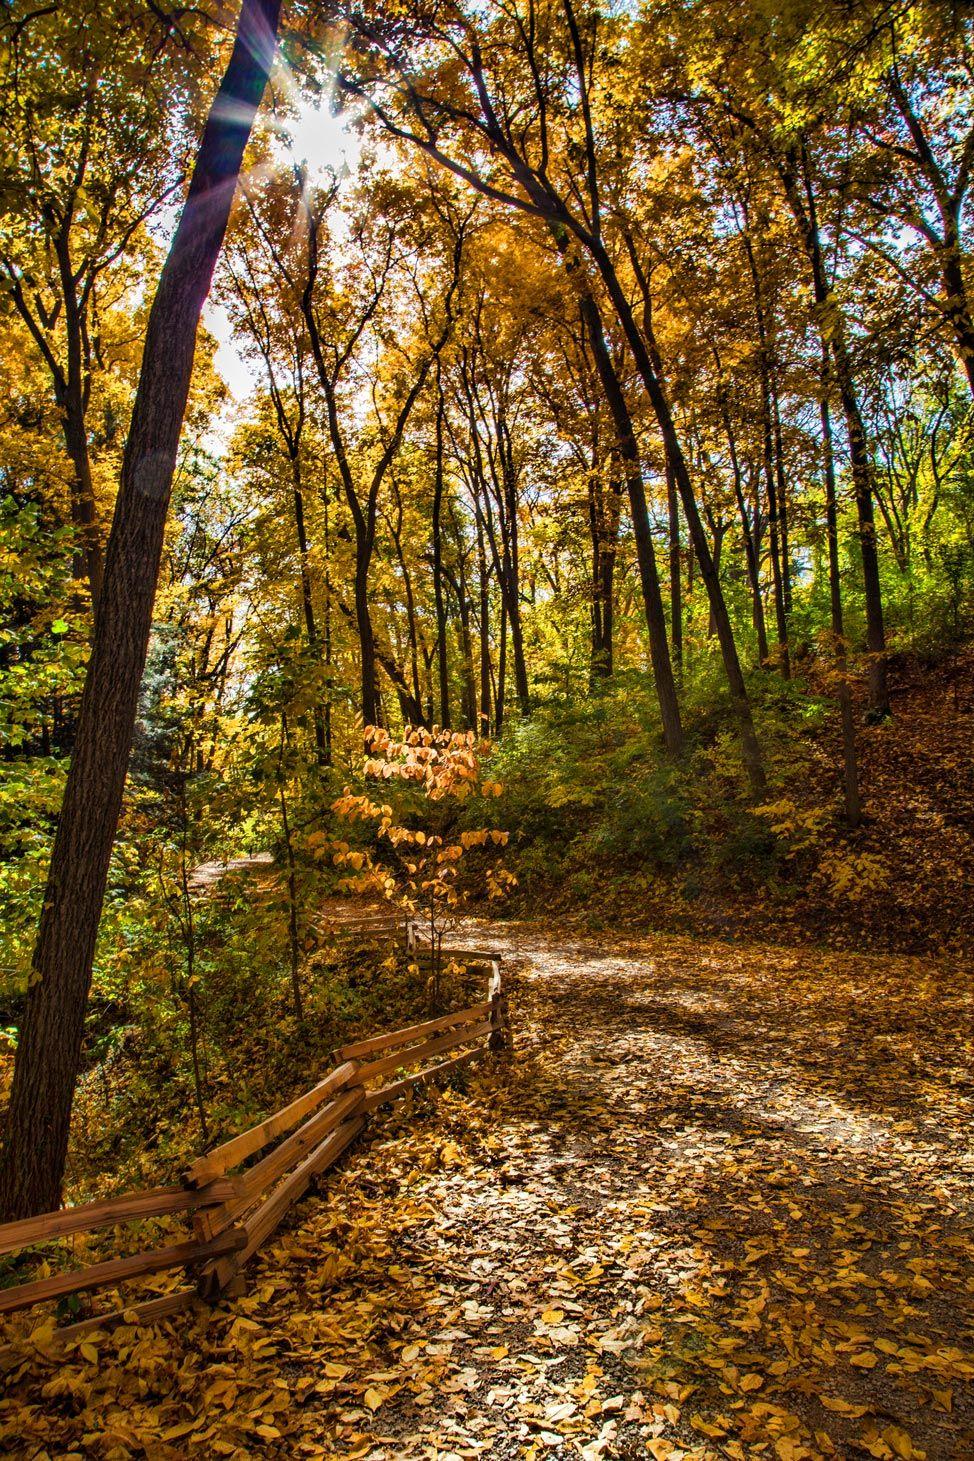 Autumn in Ann Arbor | America | Pinterest | Ann arbor, Arbors and Ann